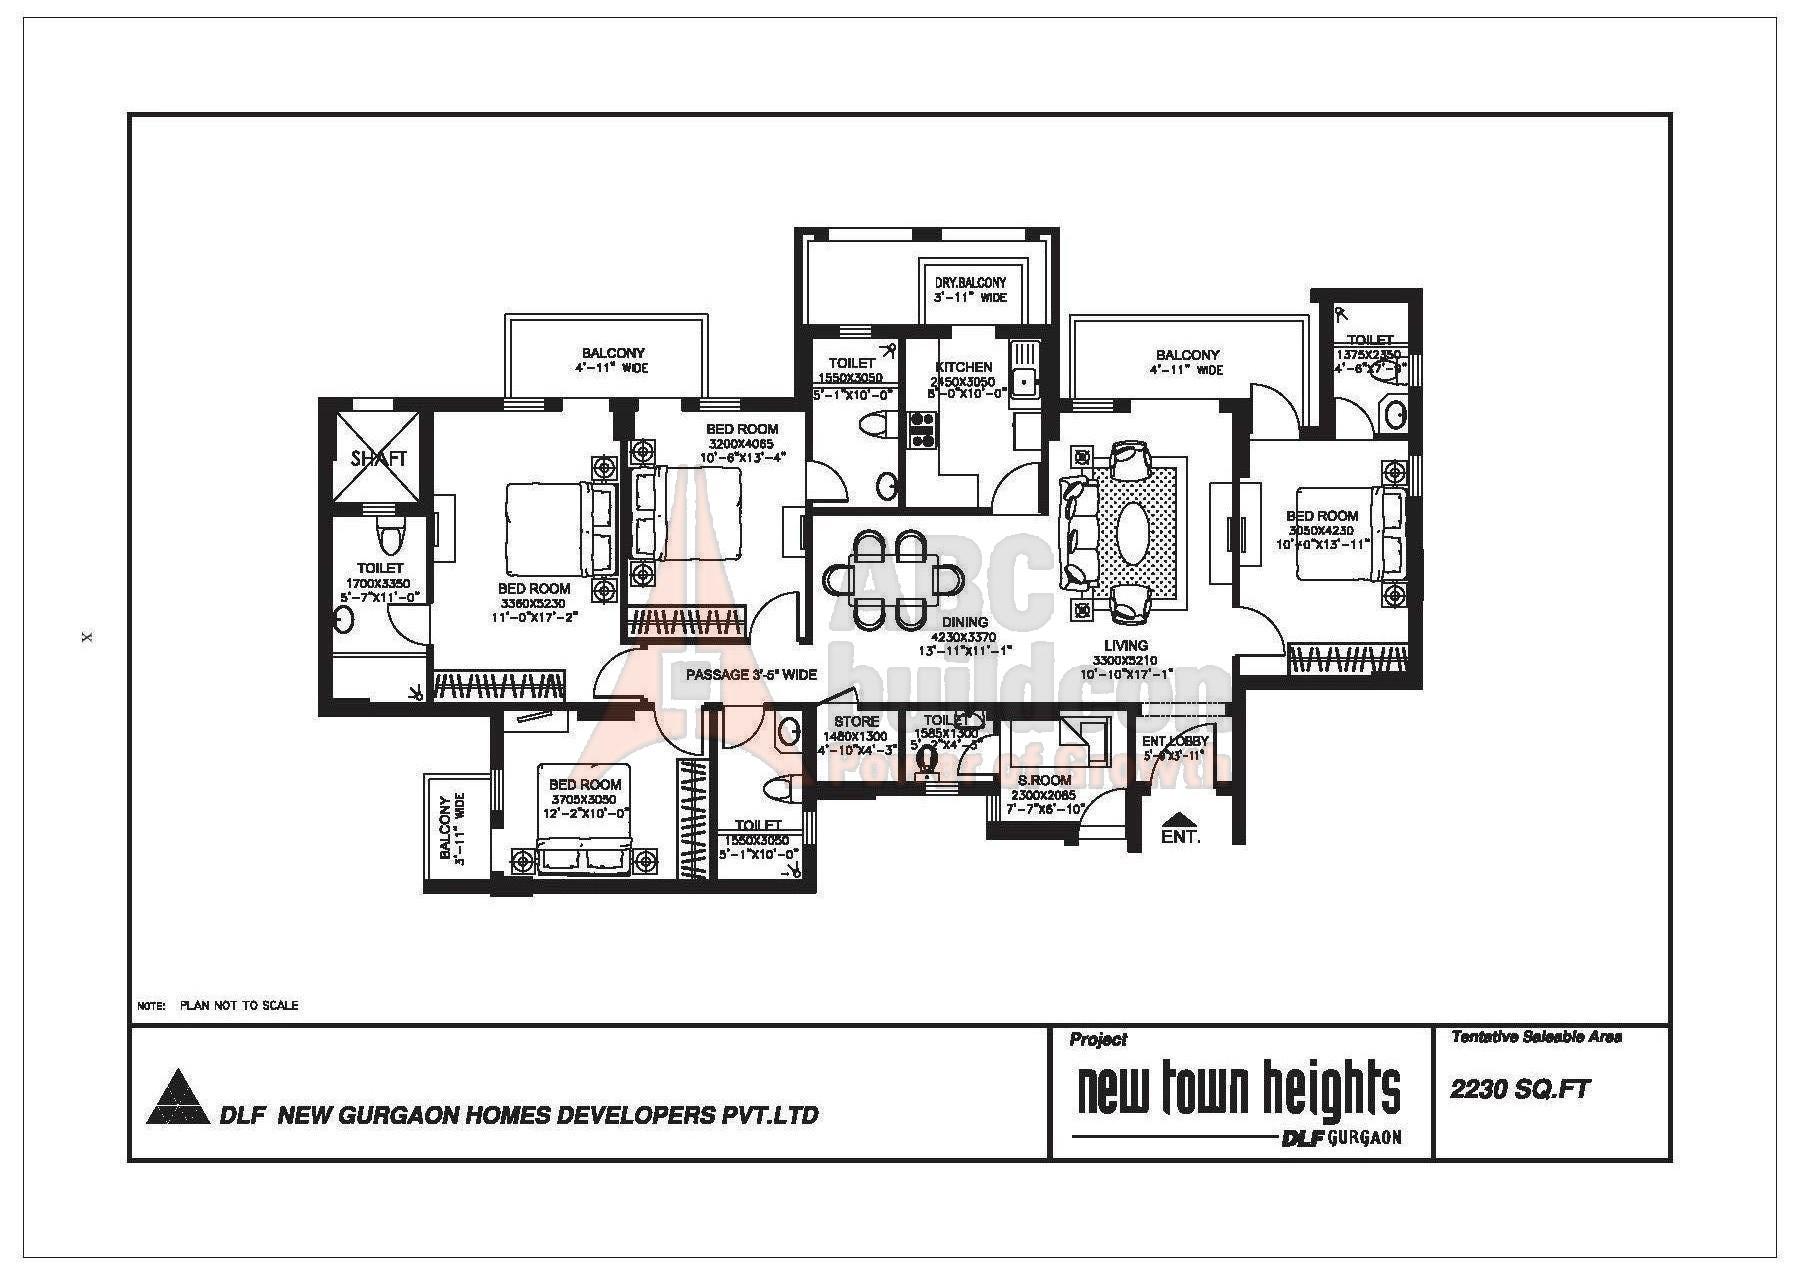 Dlf New Town Heights Floor Plan Floorplan In